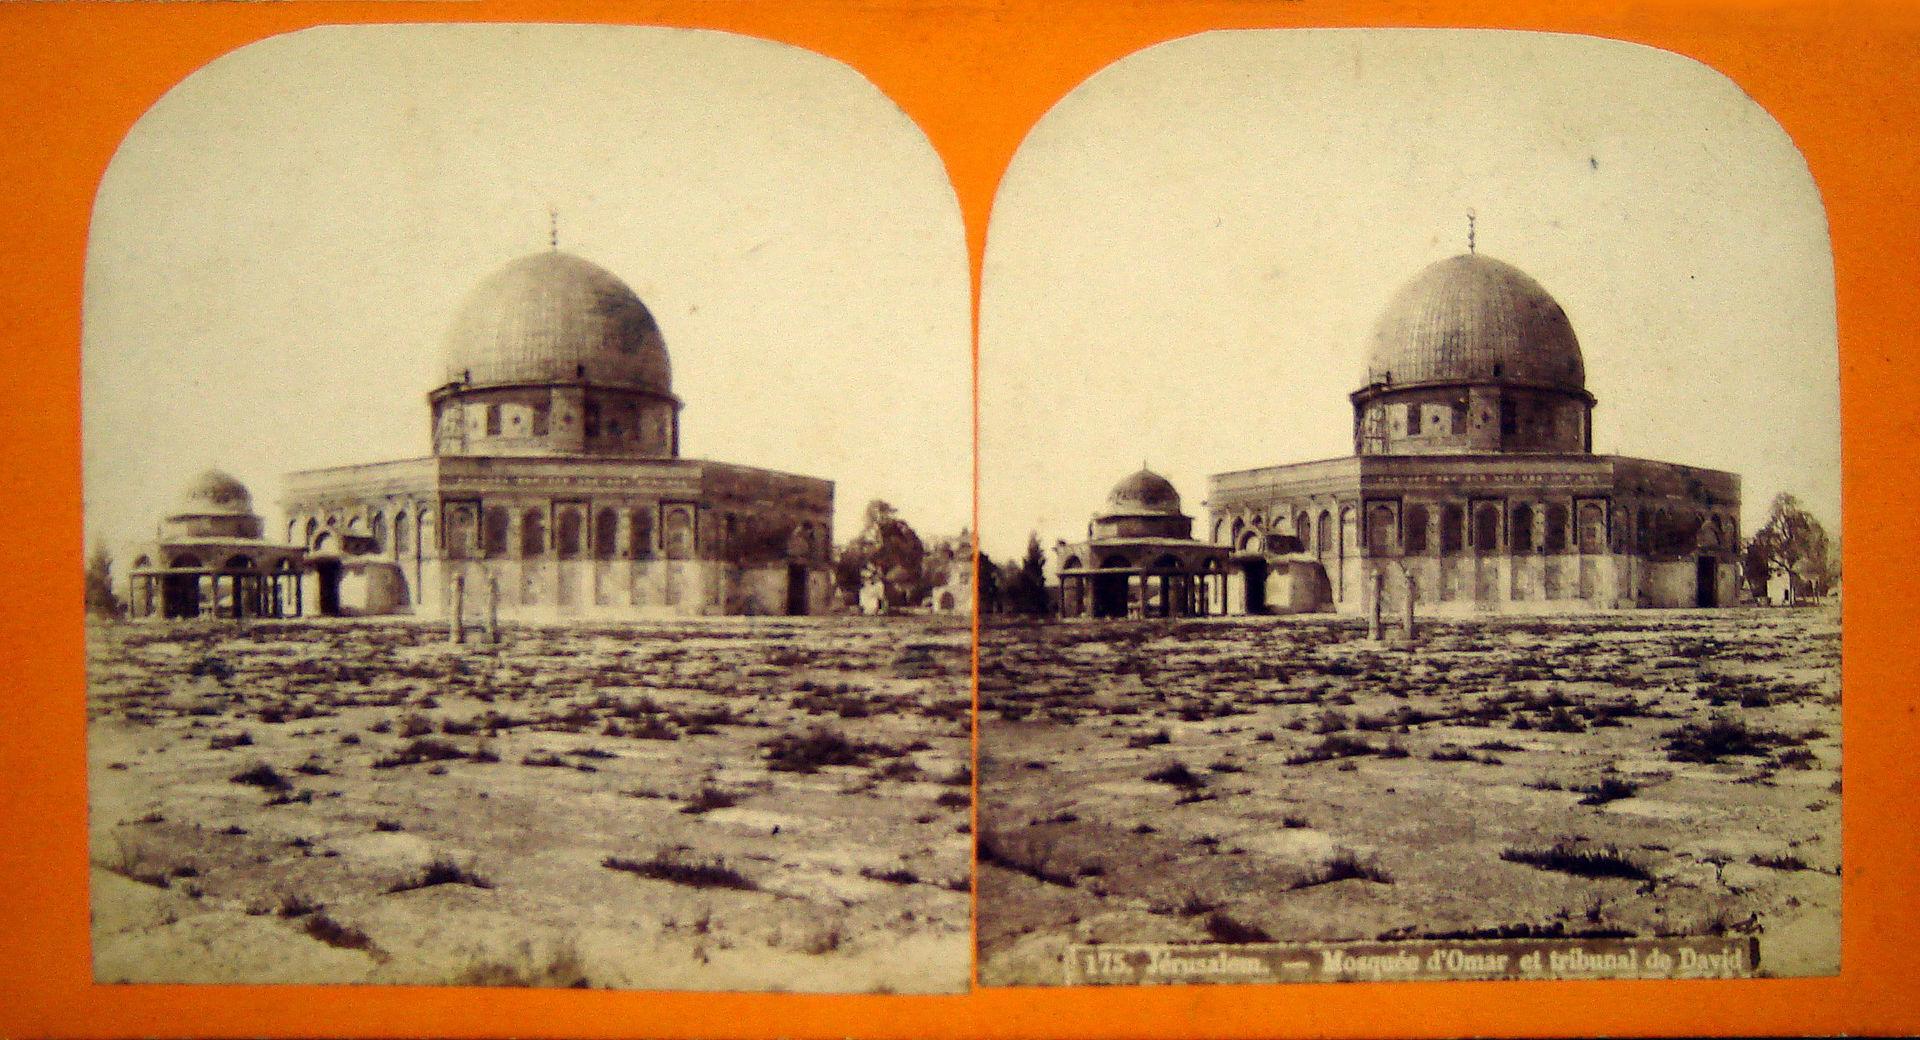 Histoire des arabes en palestine wikip dia for Histoire des jardins wikipedia